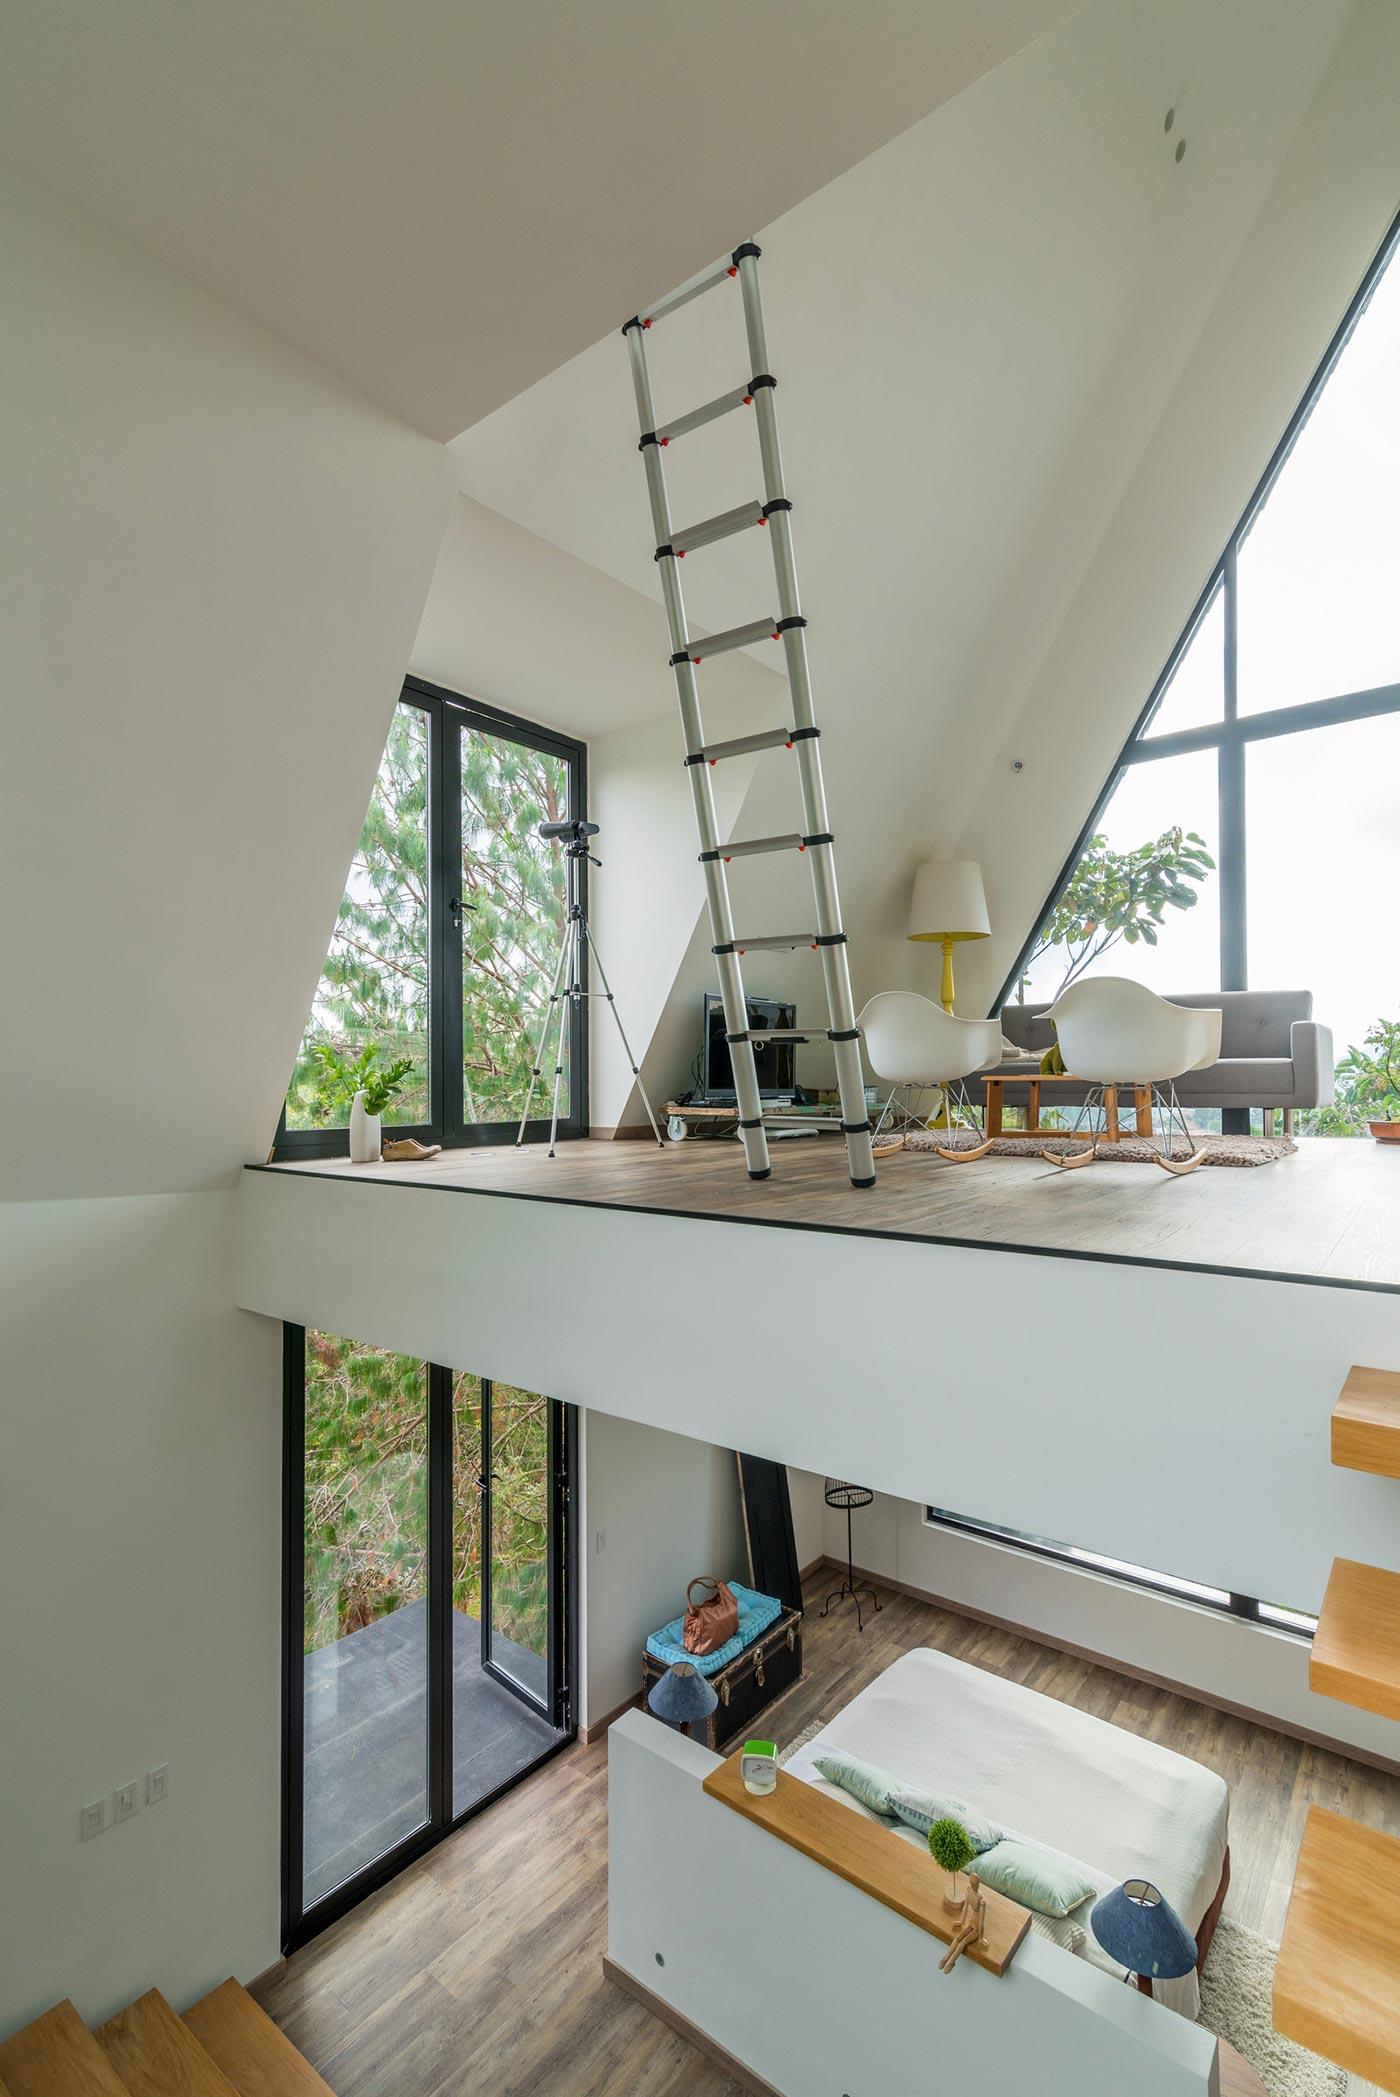 Three story interior architecture